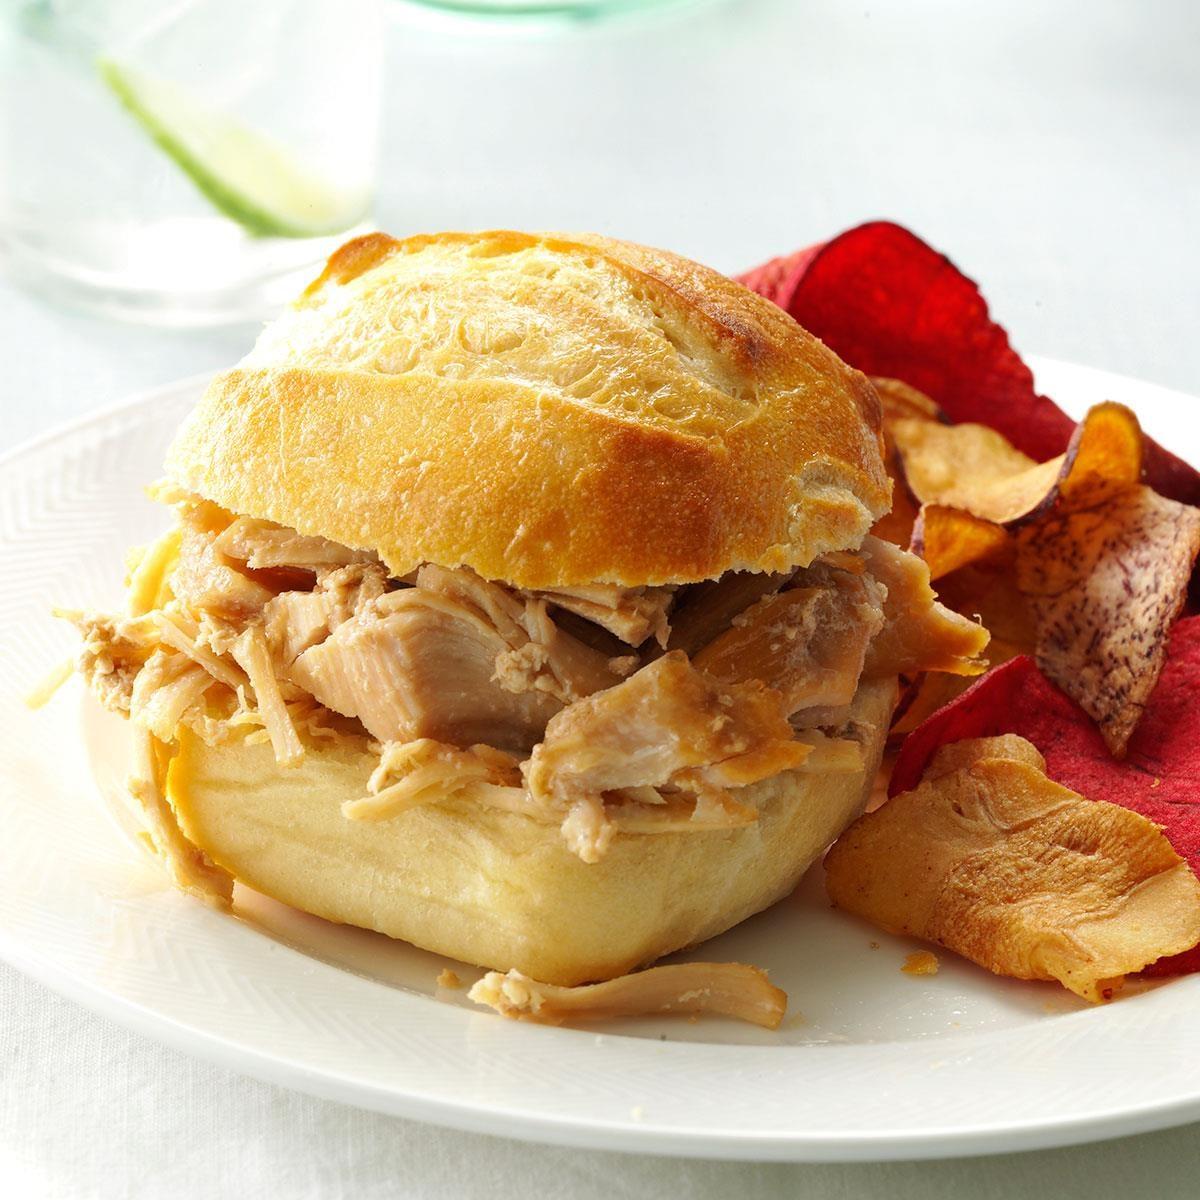 Slow Cooker Shredded Turkey Sandwiches